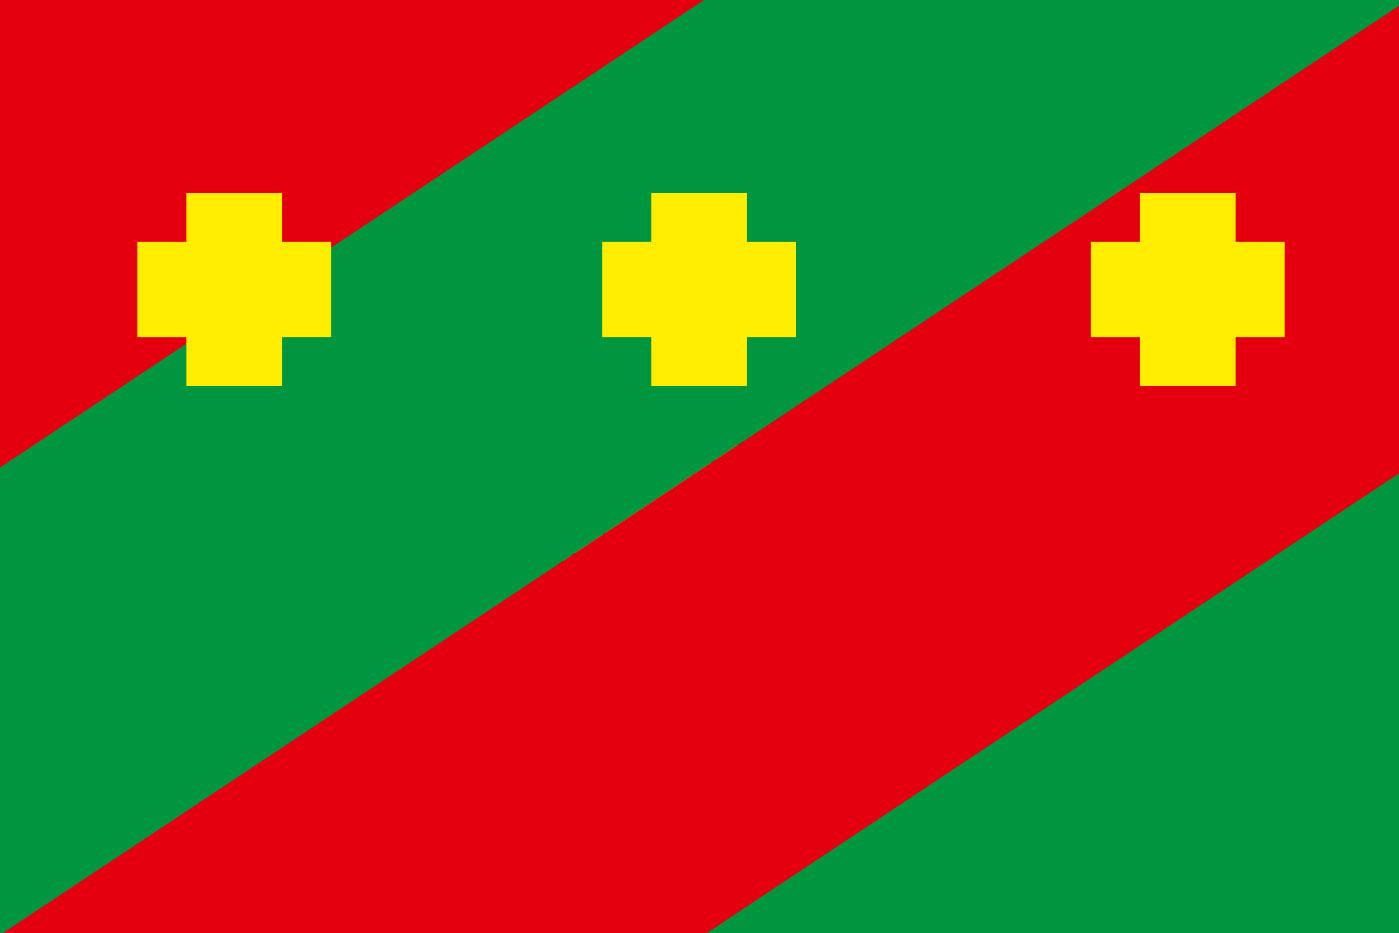 Флаг Троицкого района